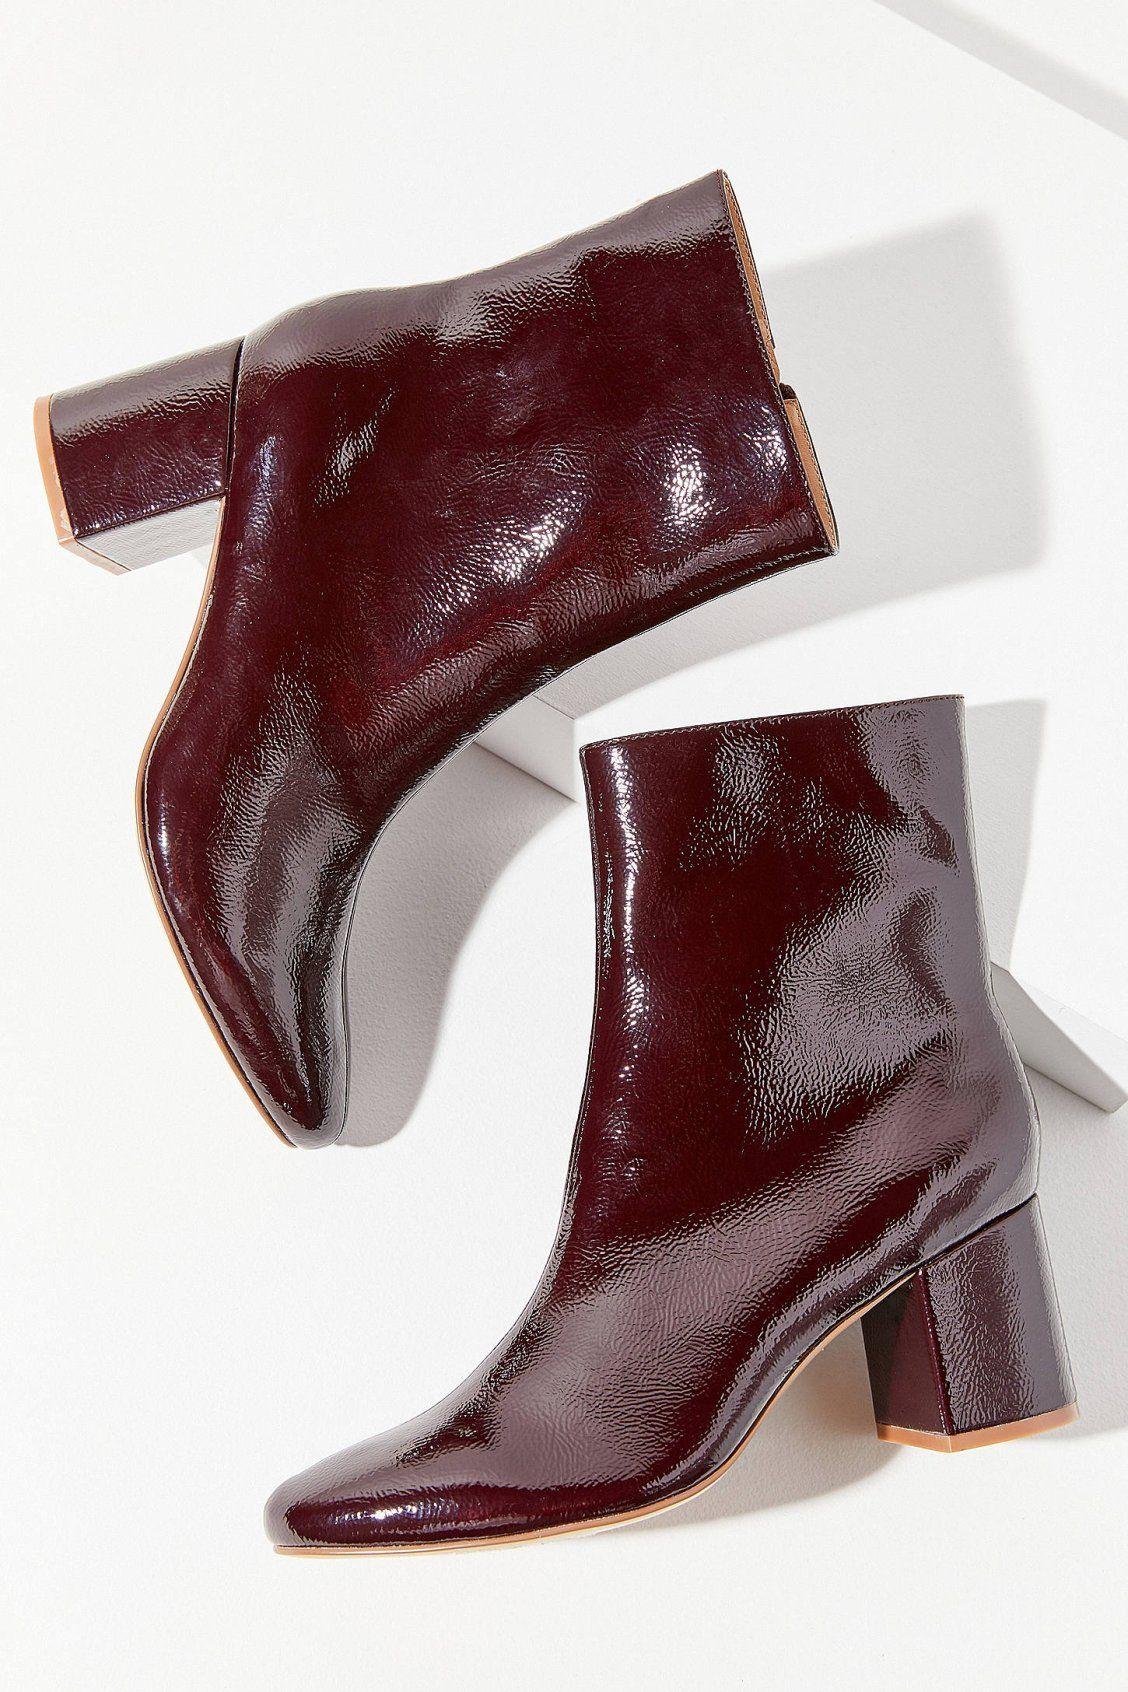 UO Alana Crinkle Patent Boot | Urban